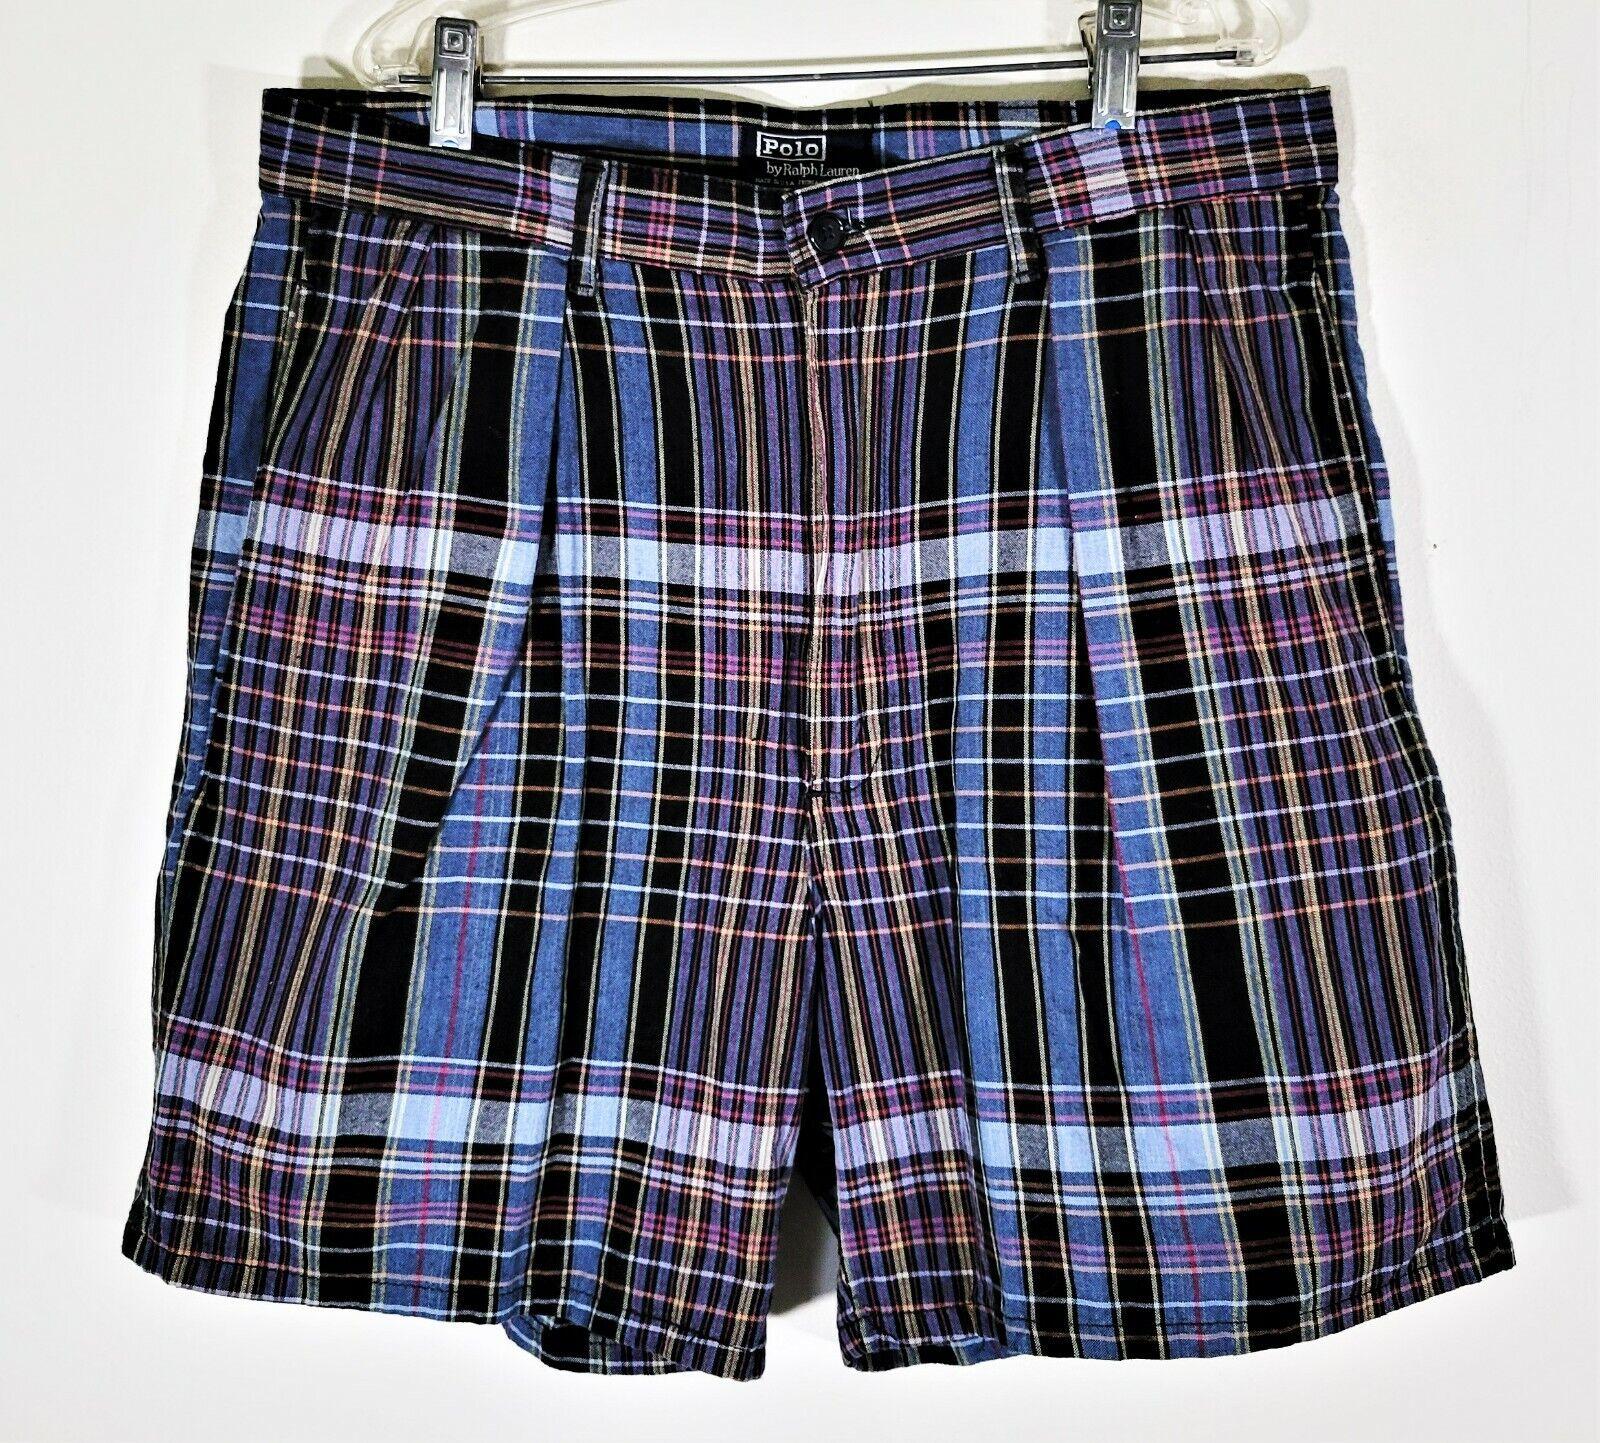 Vintage 80s 90s POLO RALPH LAUREN Madras Shorts V… - image 1